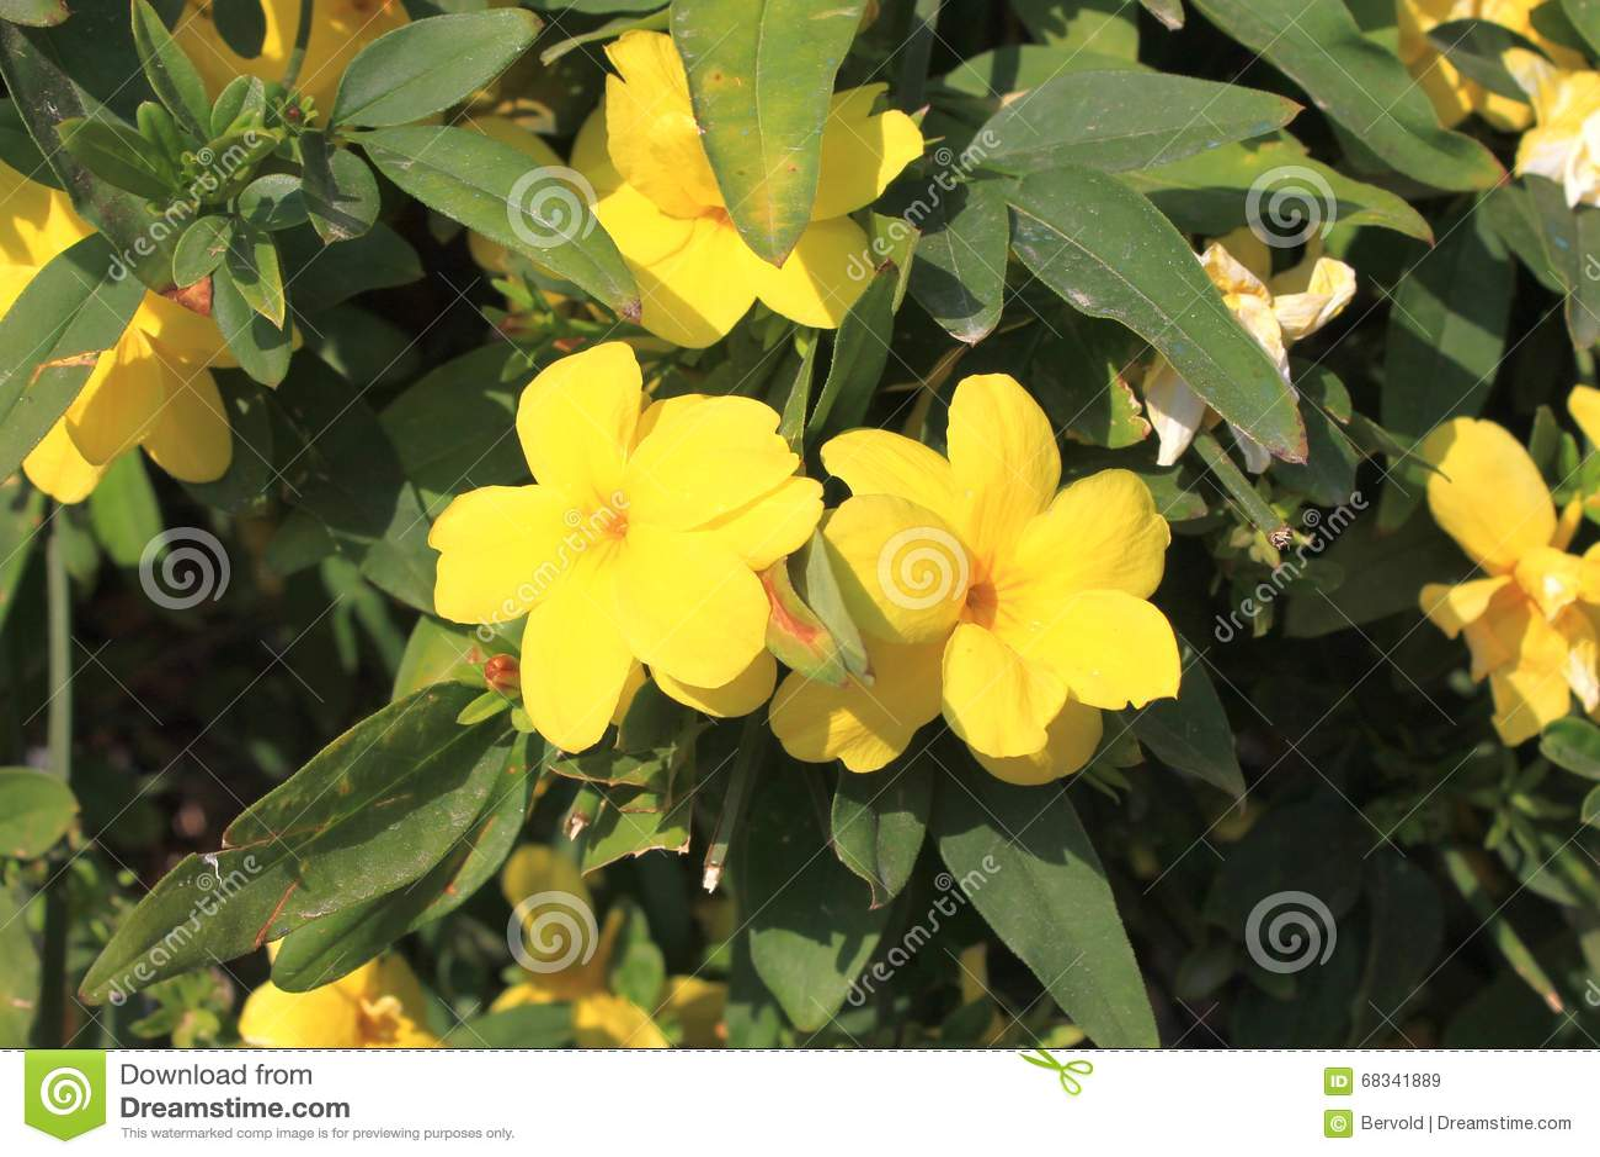 Yellow jasmine gelsemium sempervirens flowers stock image image of royalty free stock photo download yellow jasmine gelsemium sempervirens flowers stock image izmirmasajfo Images